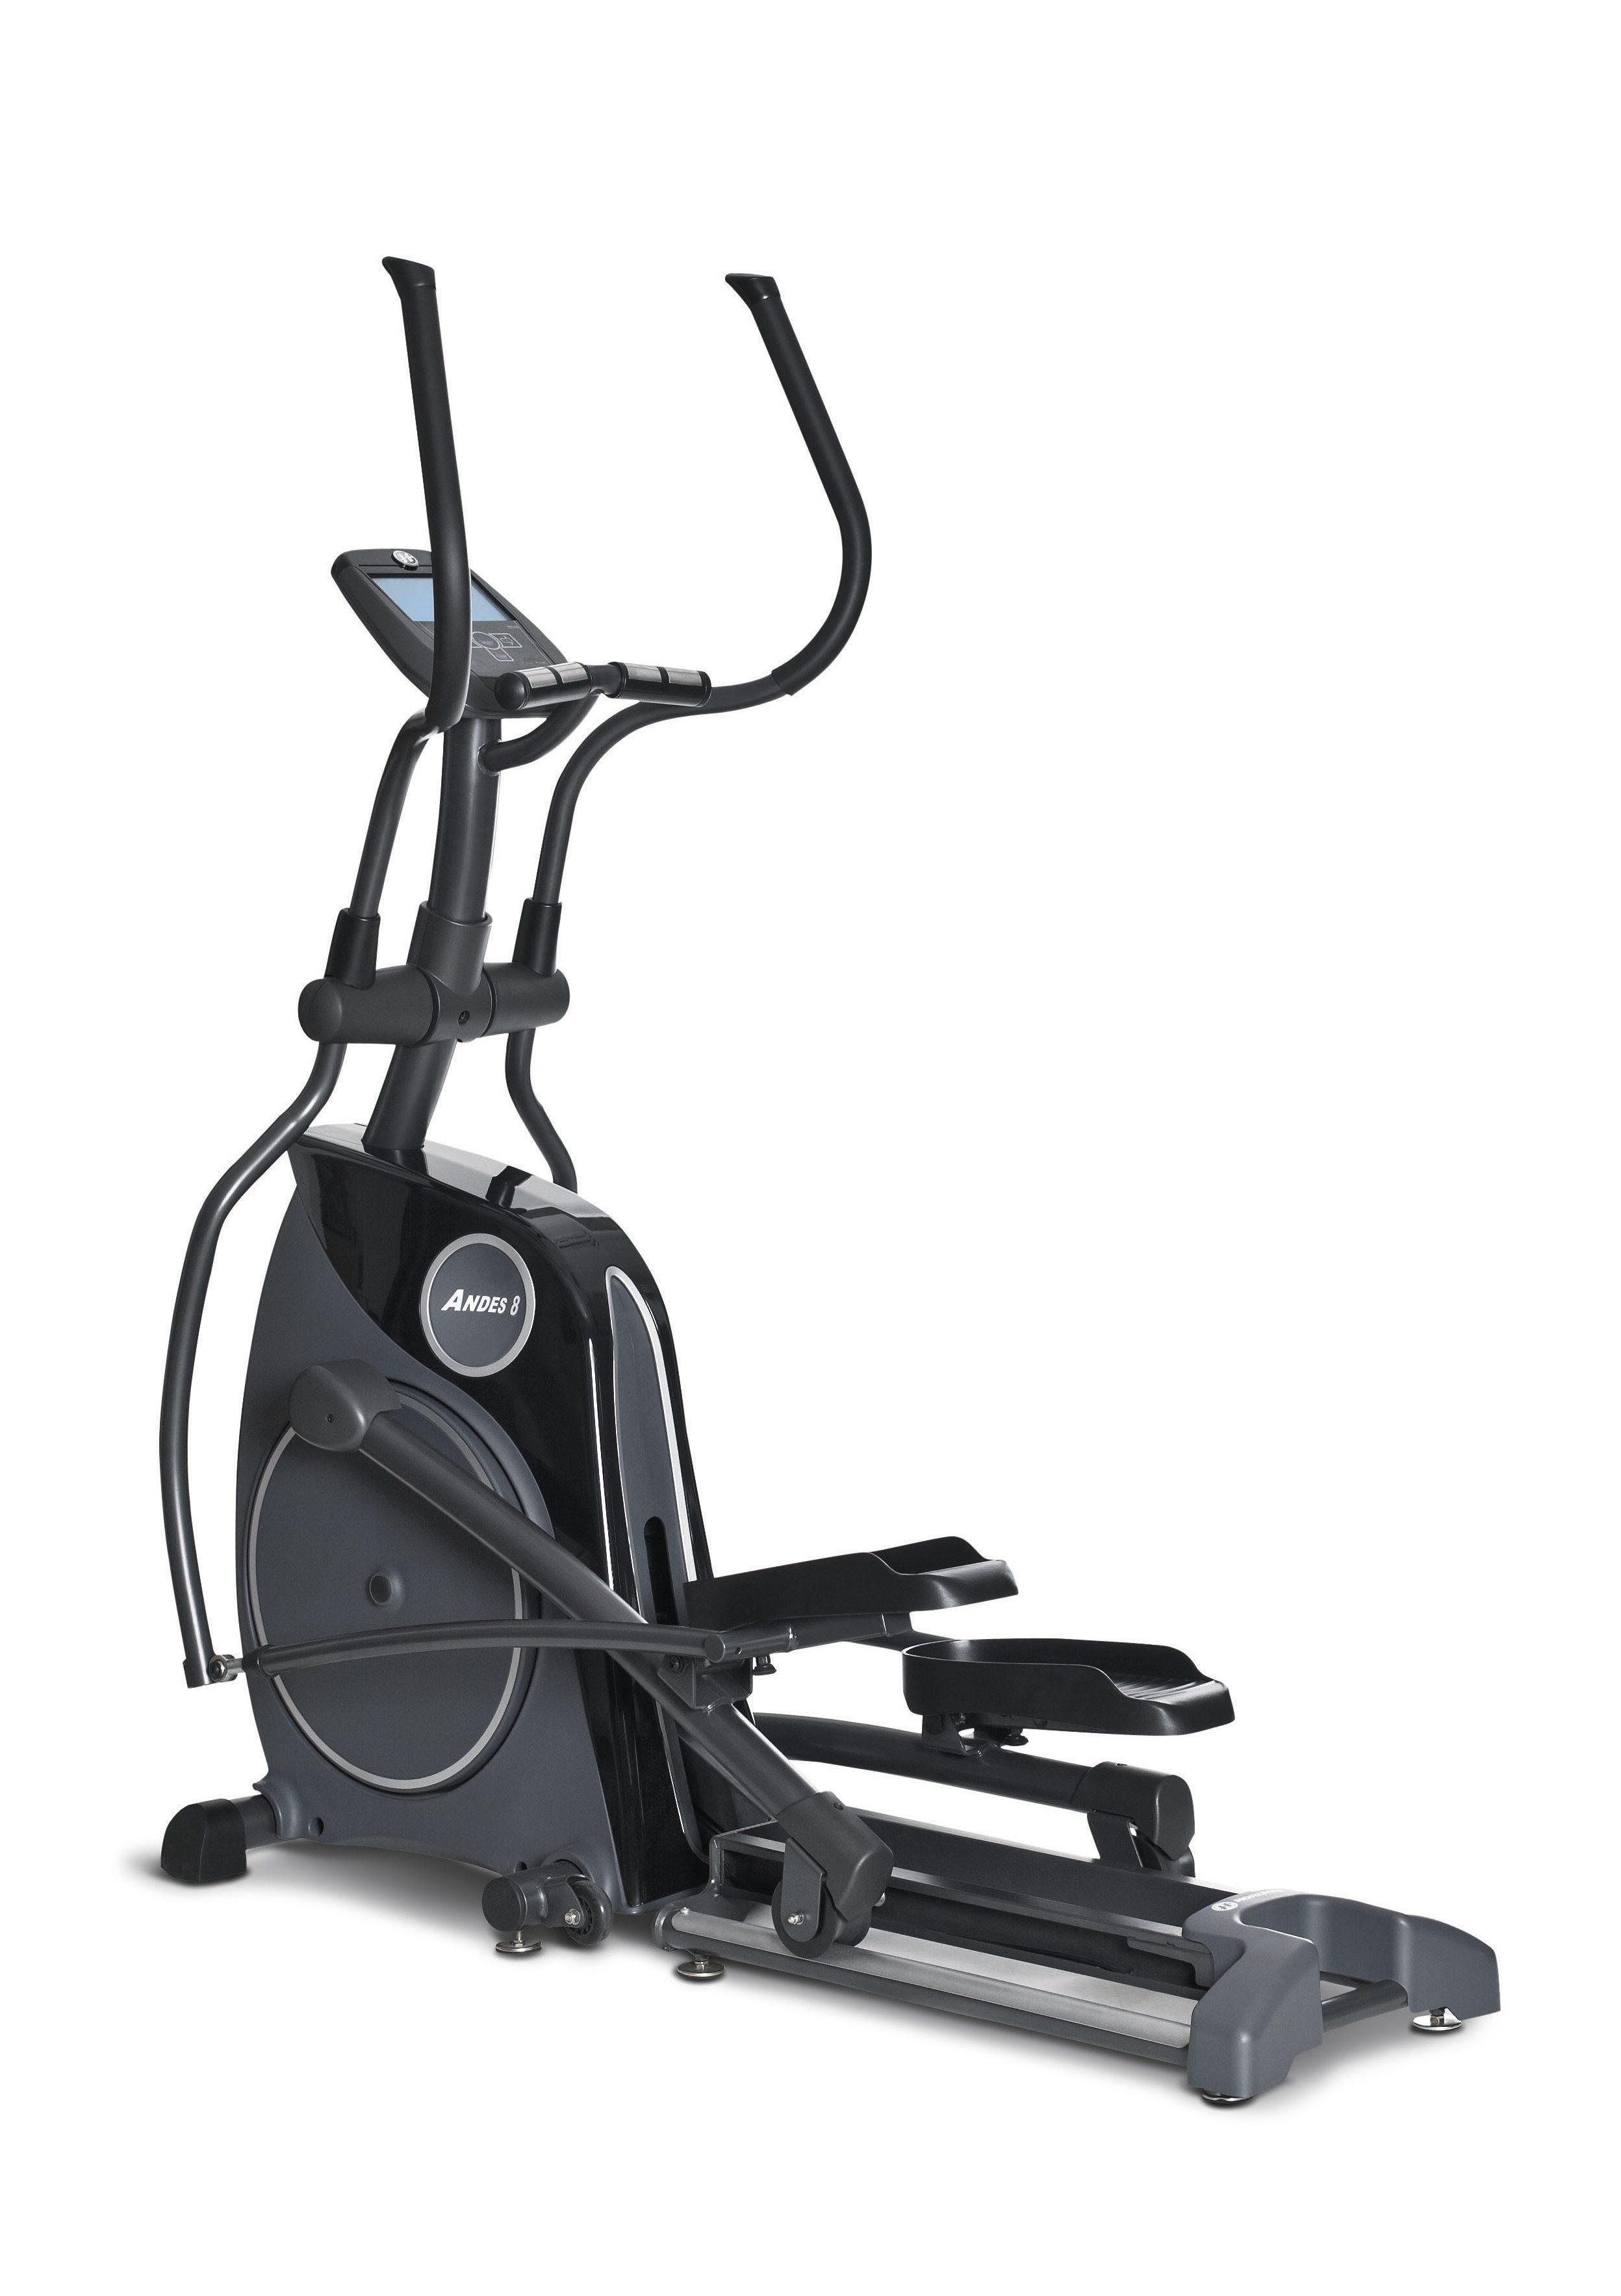 Horizon Fitness Crosstrainer-Ergometer  Andes 8i  Preisvergleich